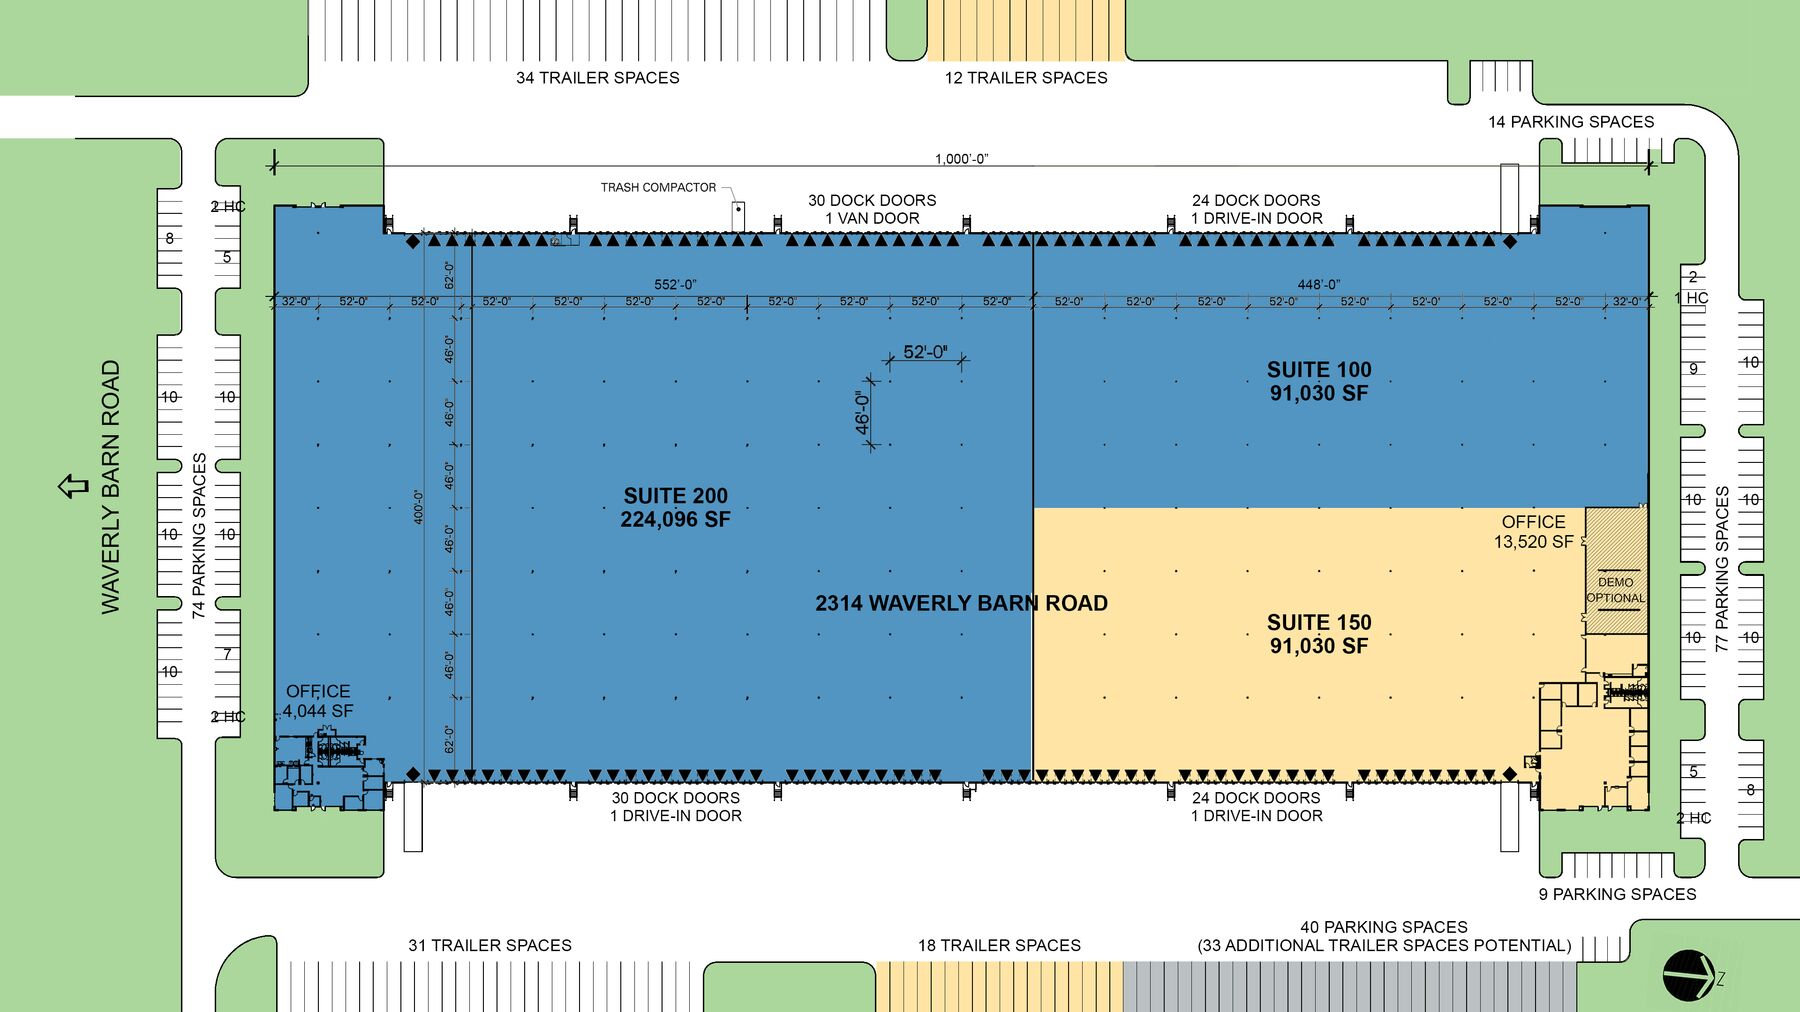 DPM-Davenport-DC_2314-Waverly-Barn-Rd-150_Flyer-Plan.jpg